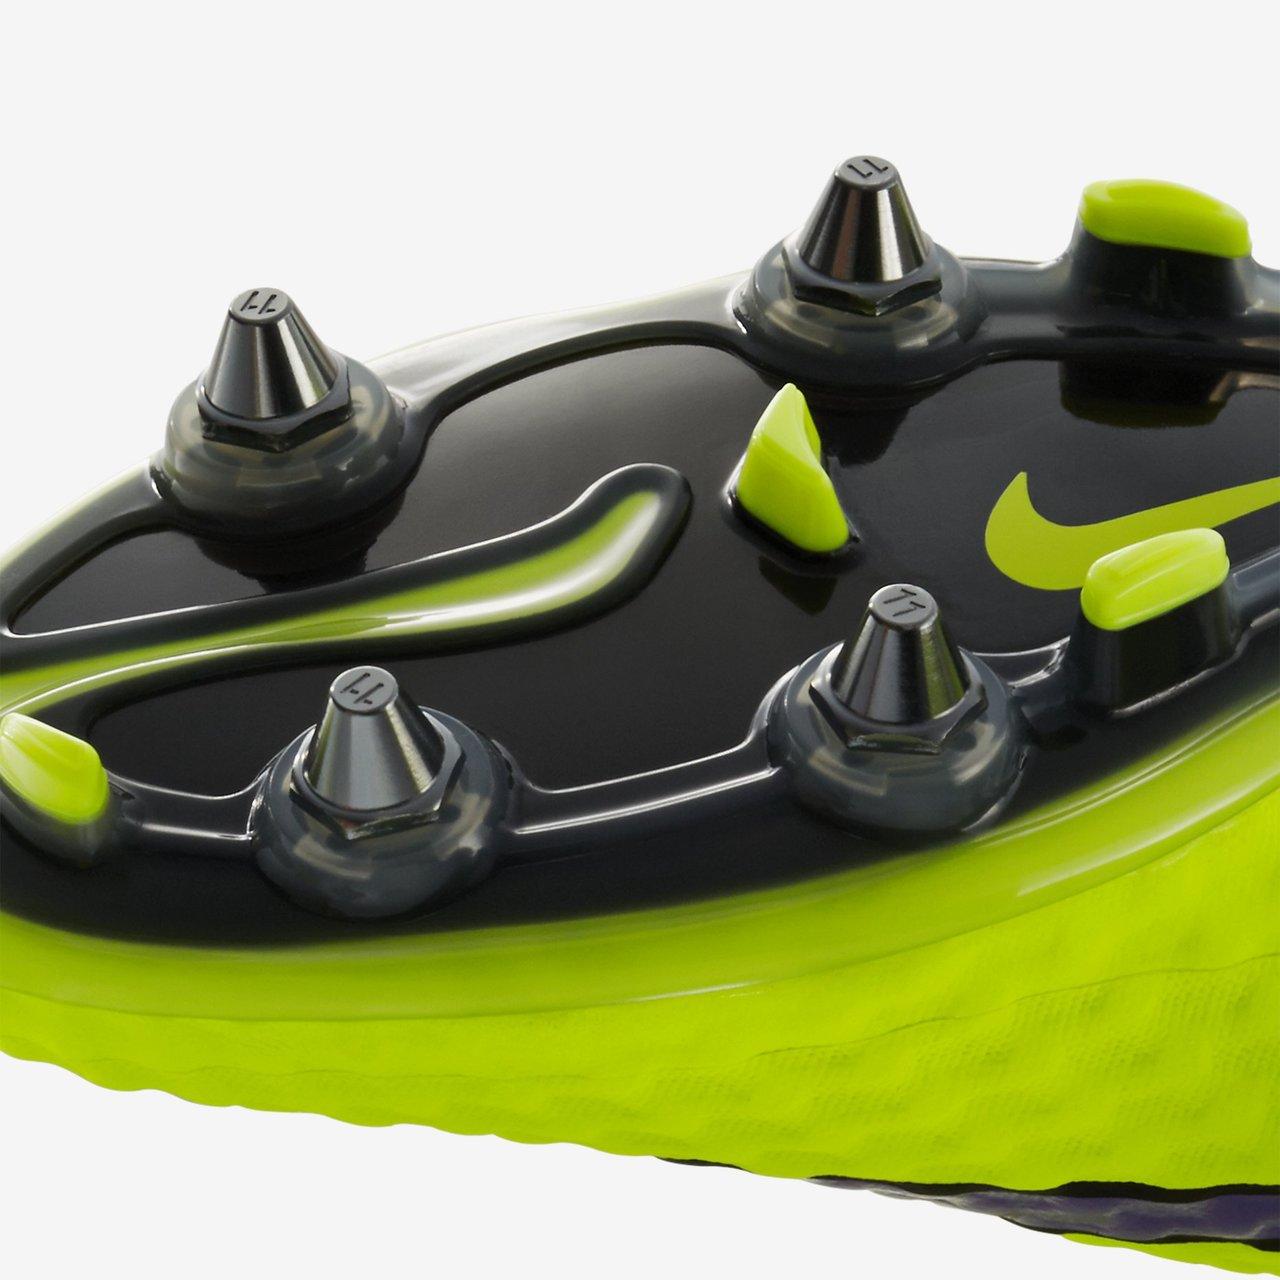 a32497036 Nike Hypervenom Phantom SG-Pro Boots - Intense Heat Pack - Volt ...